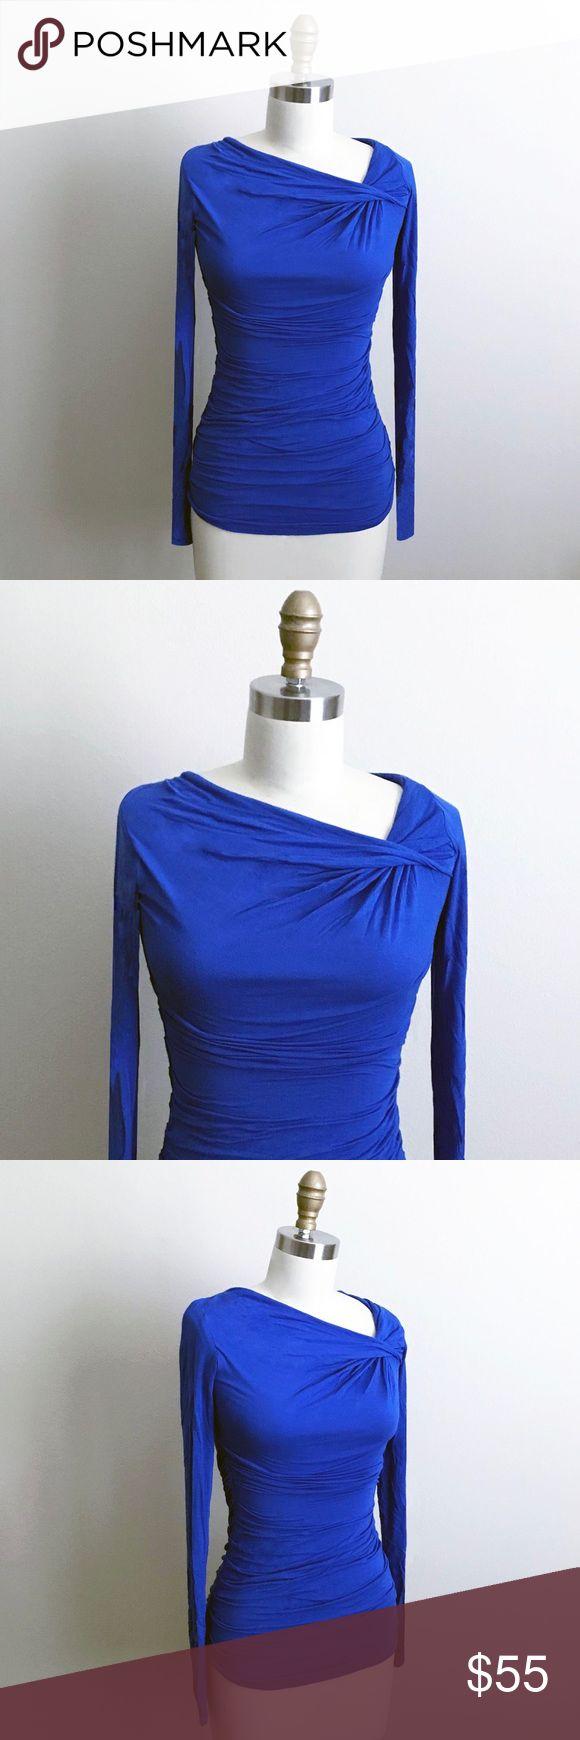 💎 Cute Bailey 44 Twist Top💎 🎉 Beautiful cobalt blue top with twist neckline 🎉 Bailey 44 Tops